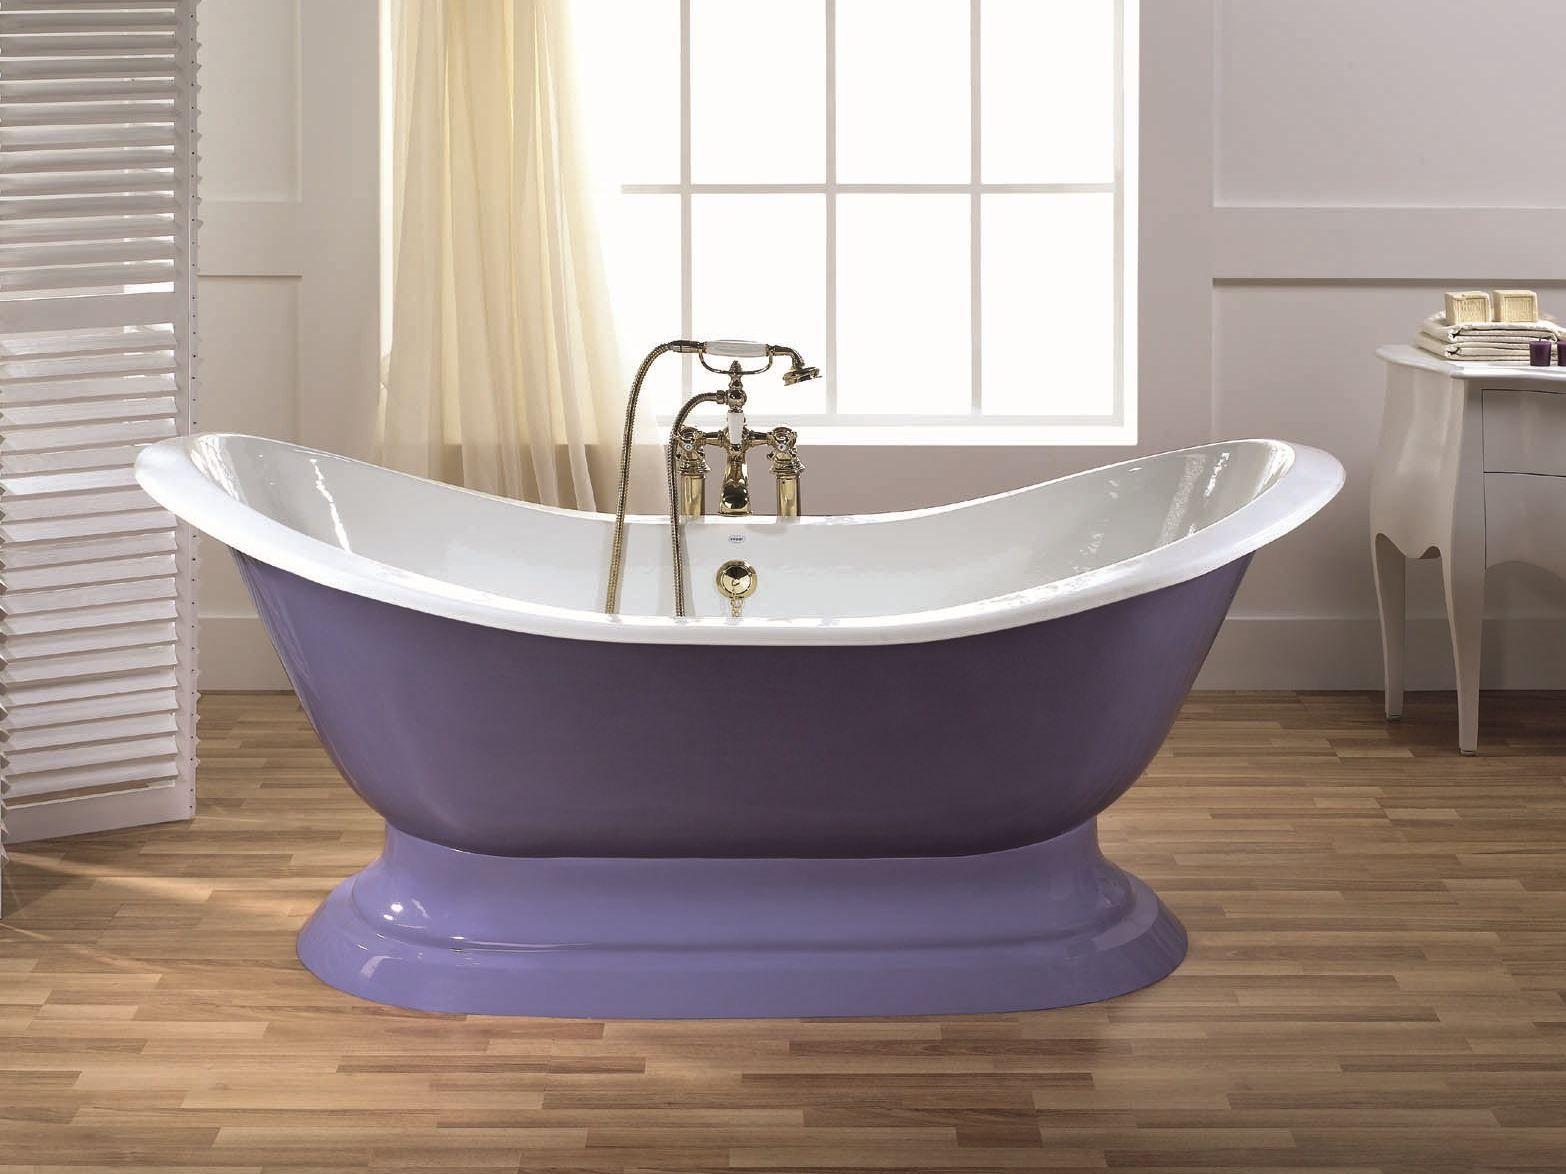 Vasca Da Bagno In Rame Prezzi : Vasche da bagno esterne prezzi. good vasca da bagno in rame